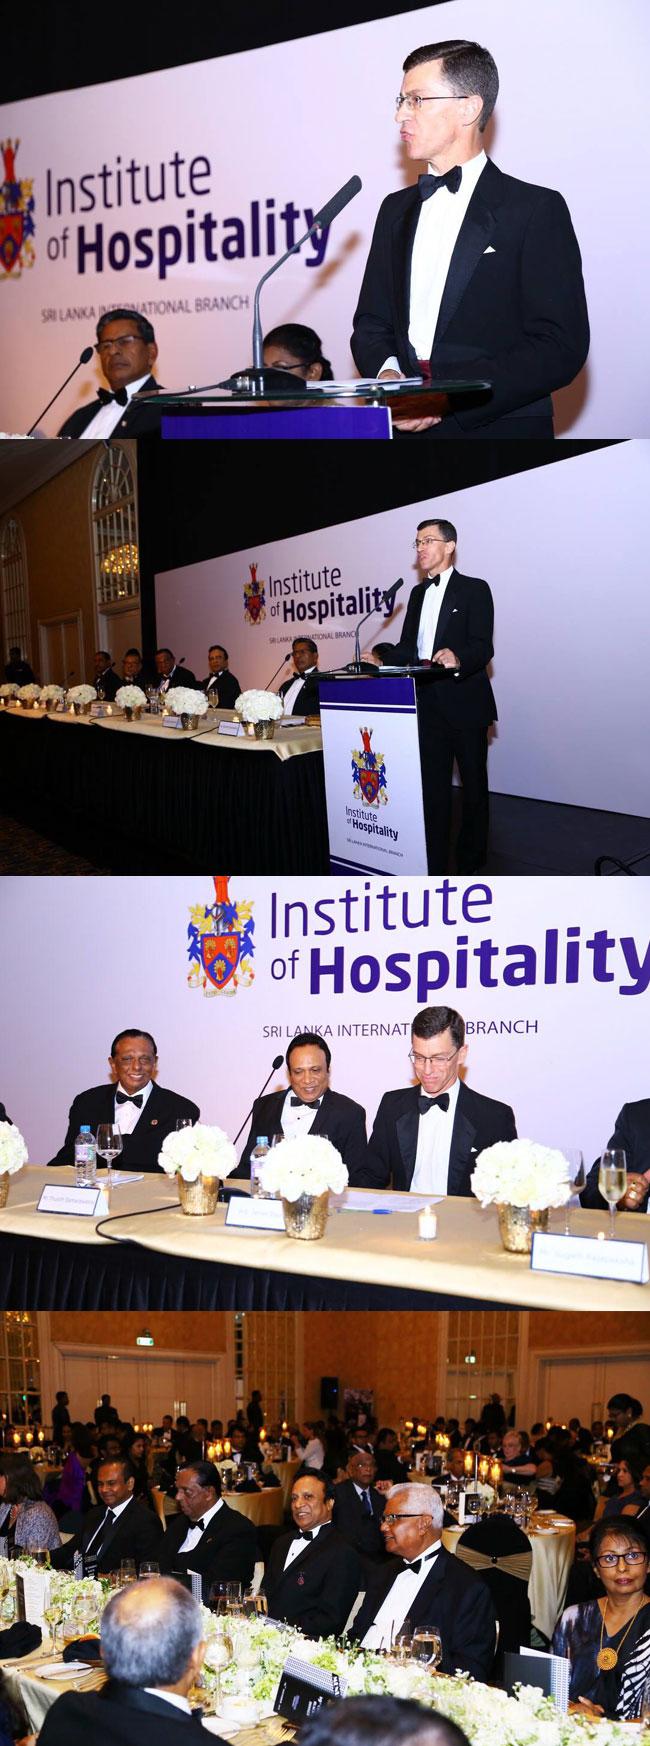 British High Commissioner extols strategic direction of tourism in Sri Lanka